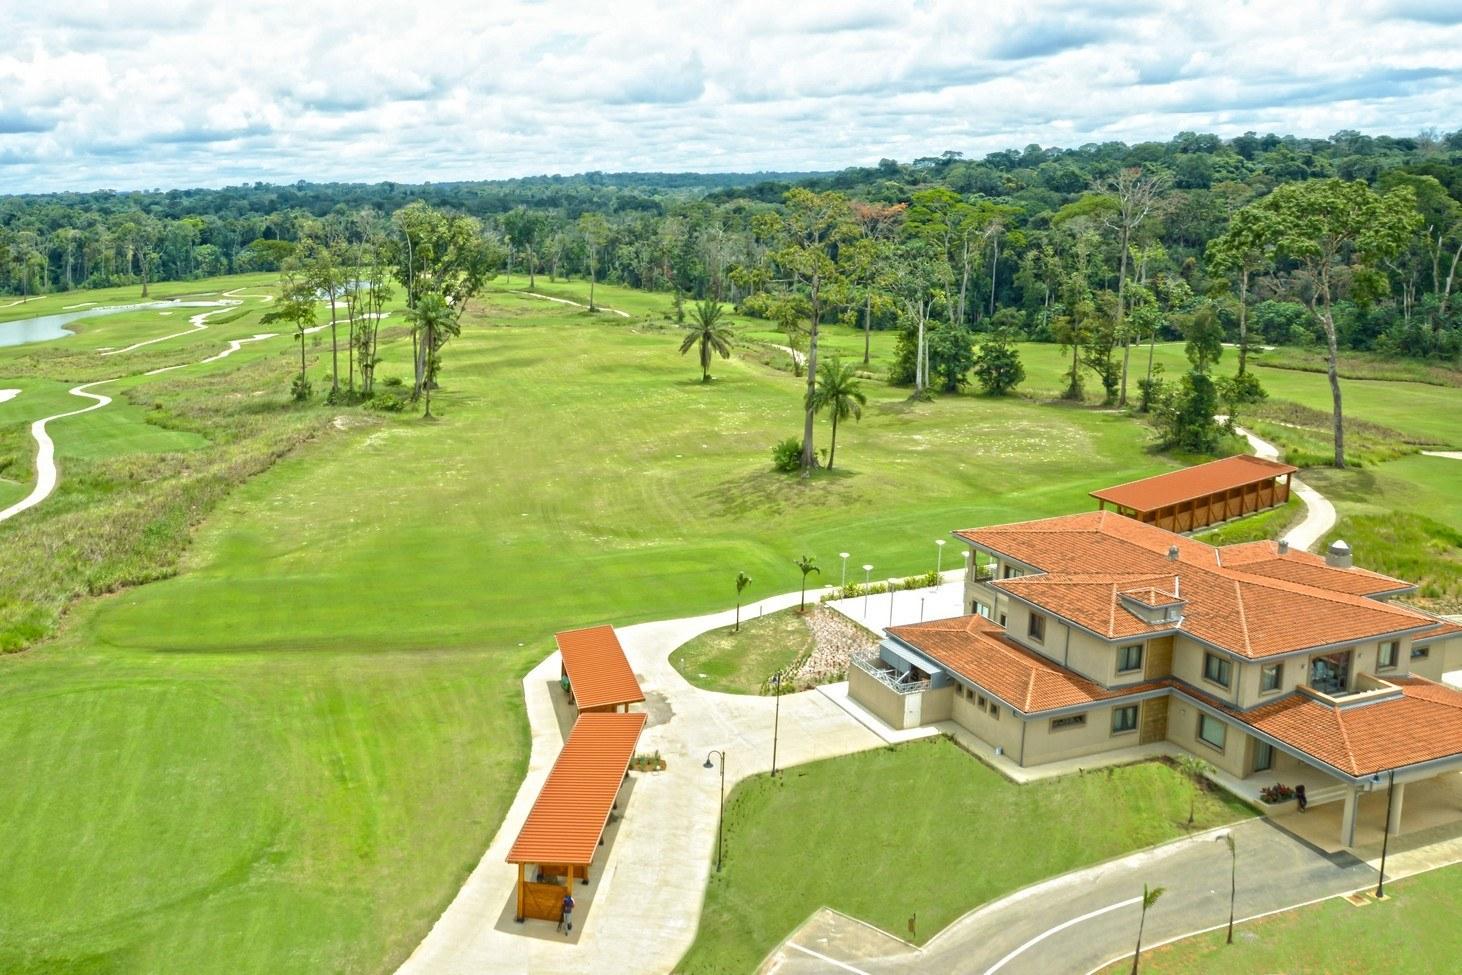 Golf Grand Hotel Djibloho